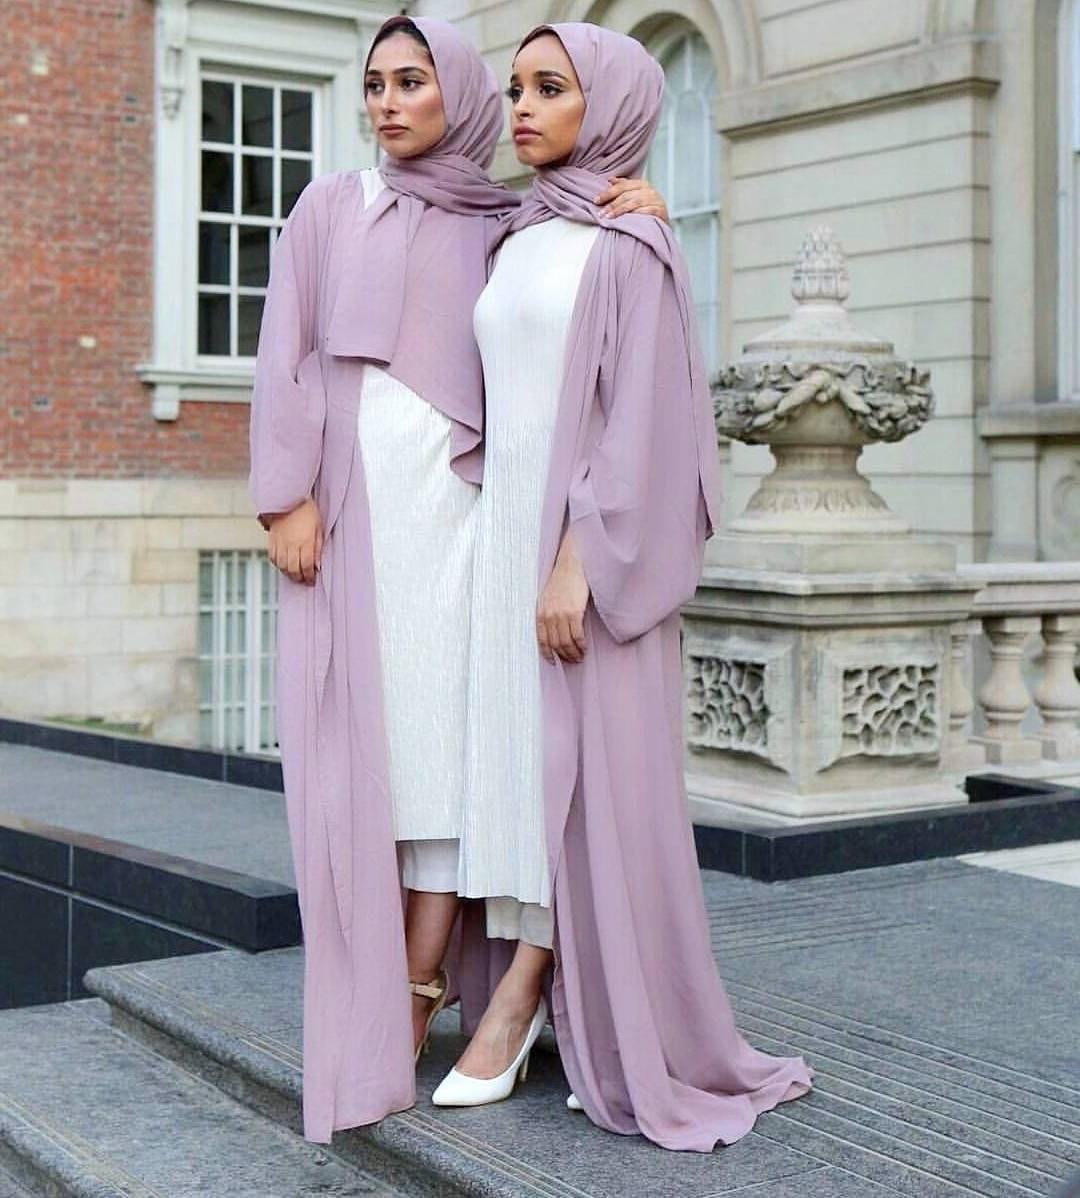 Ide Model Baju Lebaran Baru Mndw 50 Model Baju Lebaran Terbaru 2018 Modern & Elegan